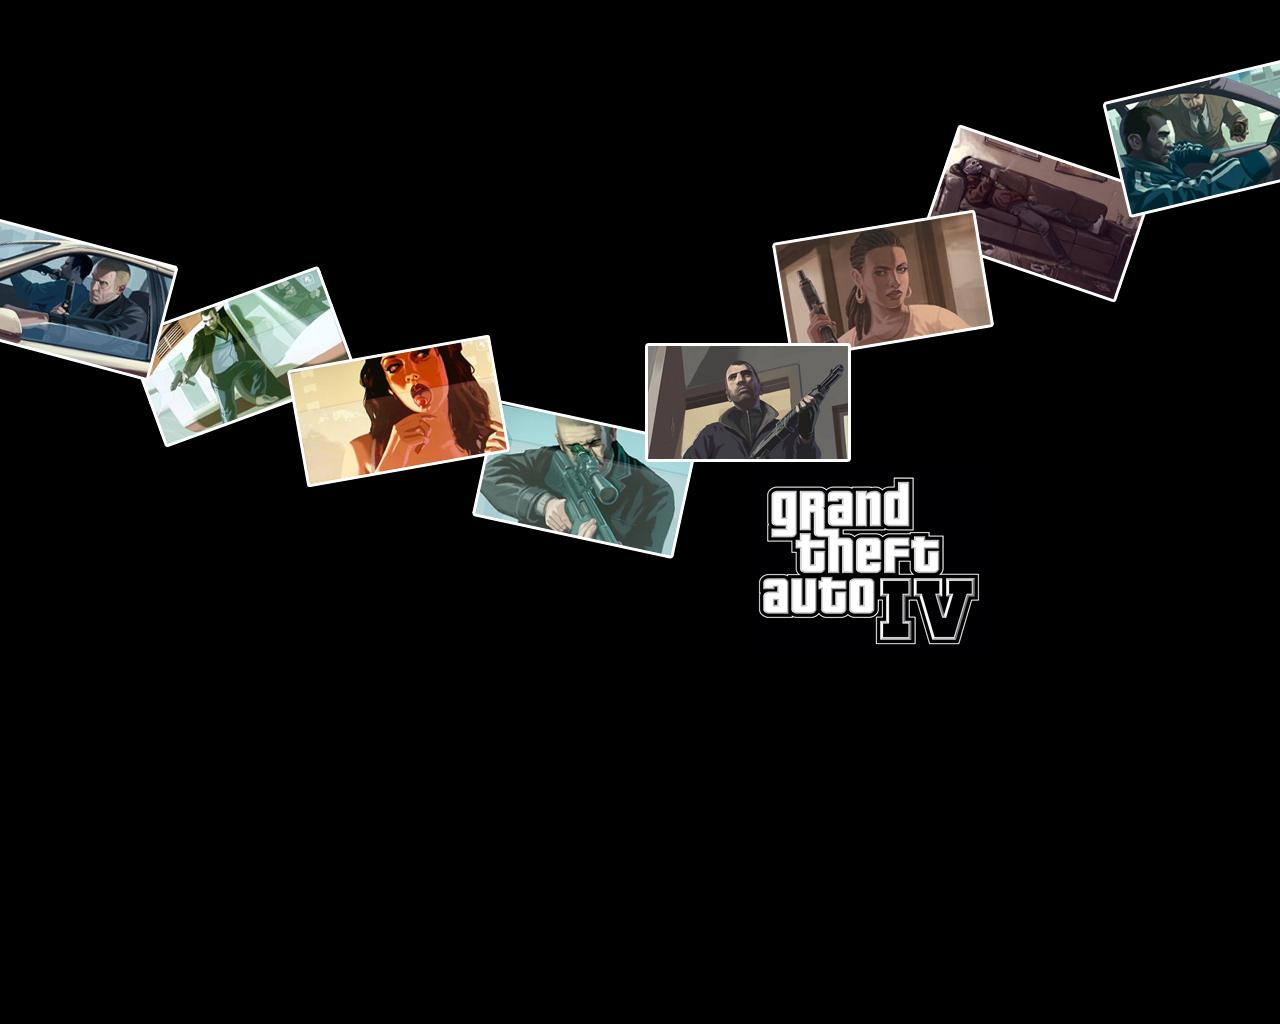 Shots   Grand Theft Auto IV ^ GTA 4 Nico Xbox Artwork 1280x1024